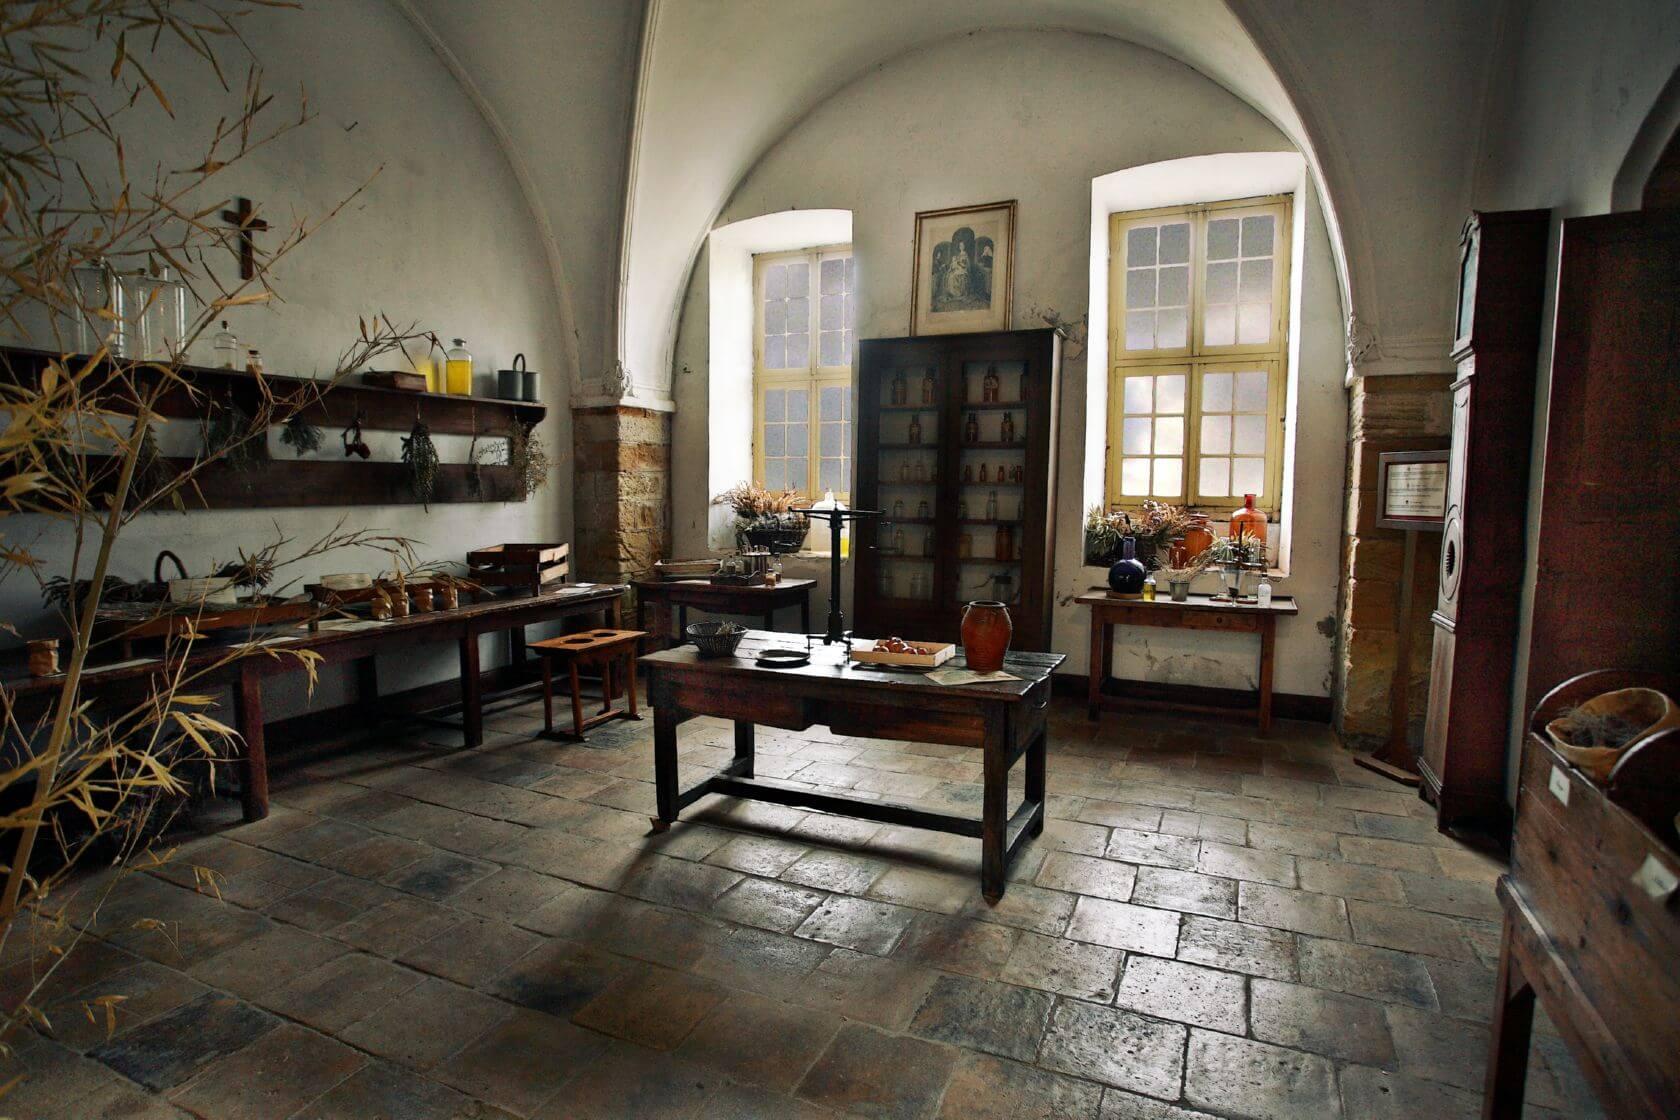 photos d 39 int rieur photographe montpellier montpellier studio photo b612. Black Bedroom Furniture Sets. Home Design Ideas